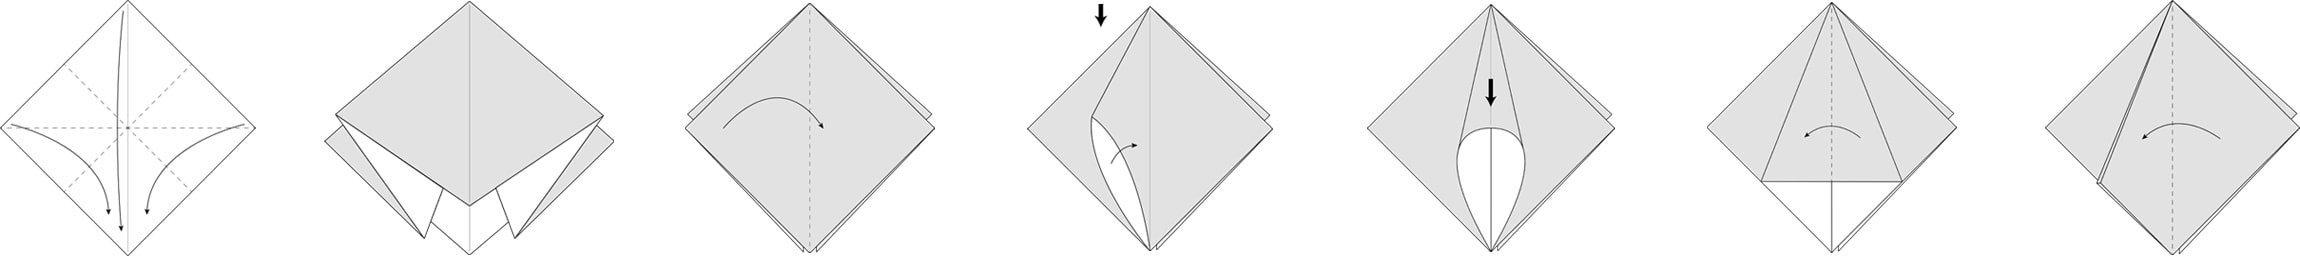 Folding Diagrams